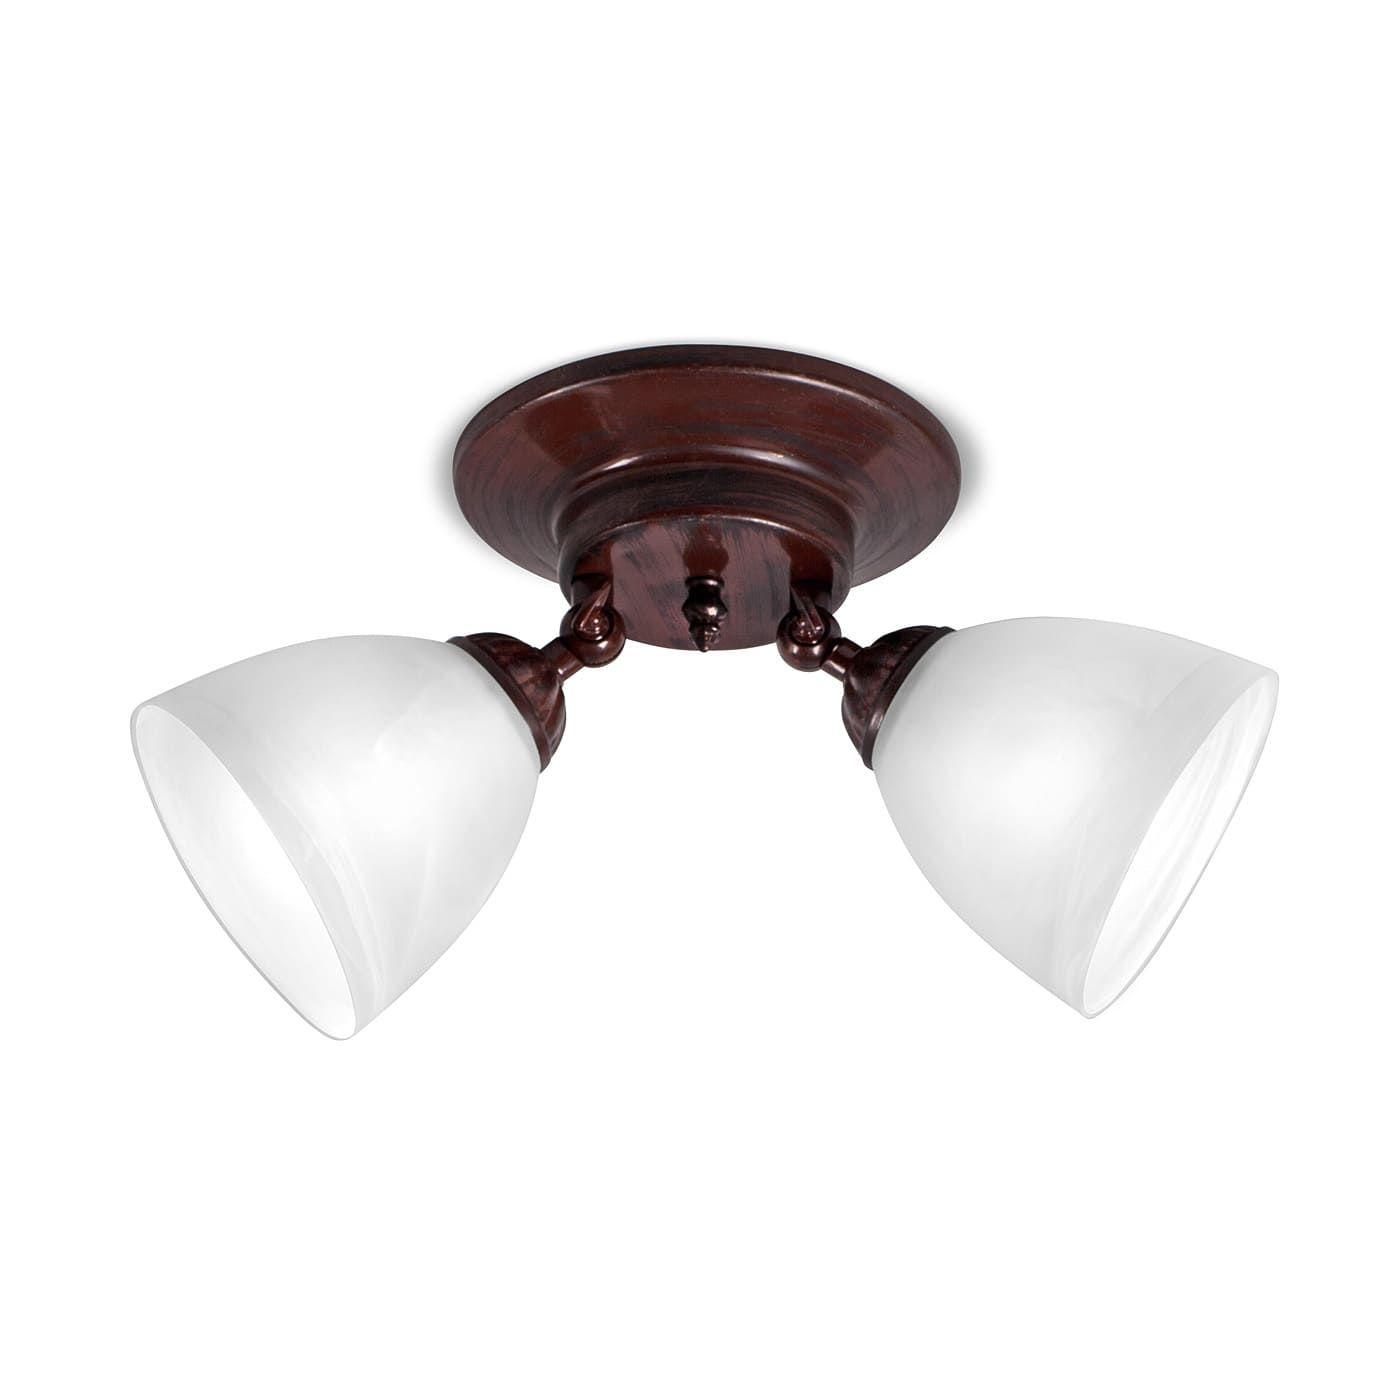 PETRASVET / Ceiling chandelier S2197-2, 2xE27 max. 60W